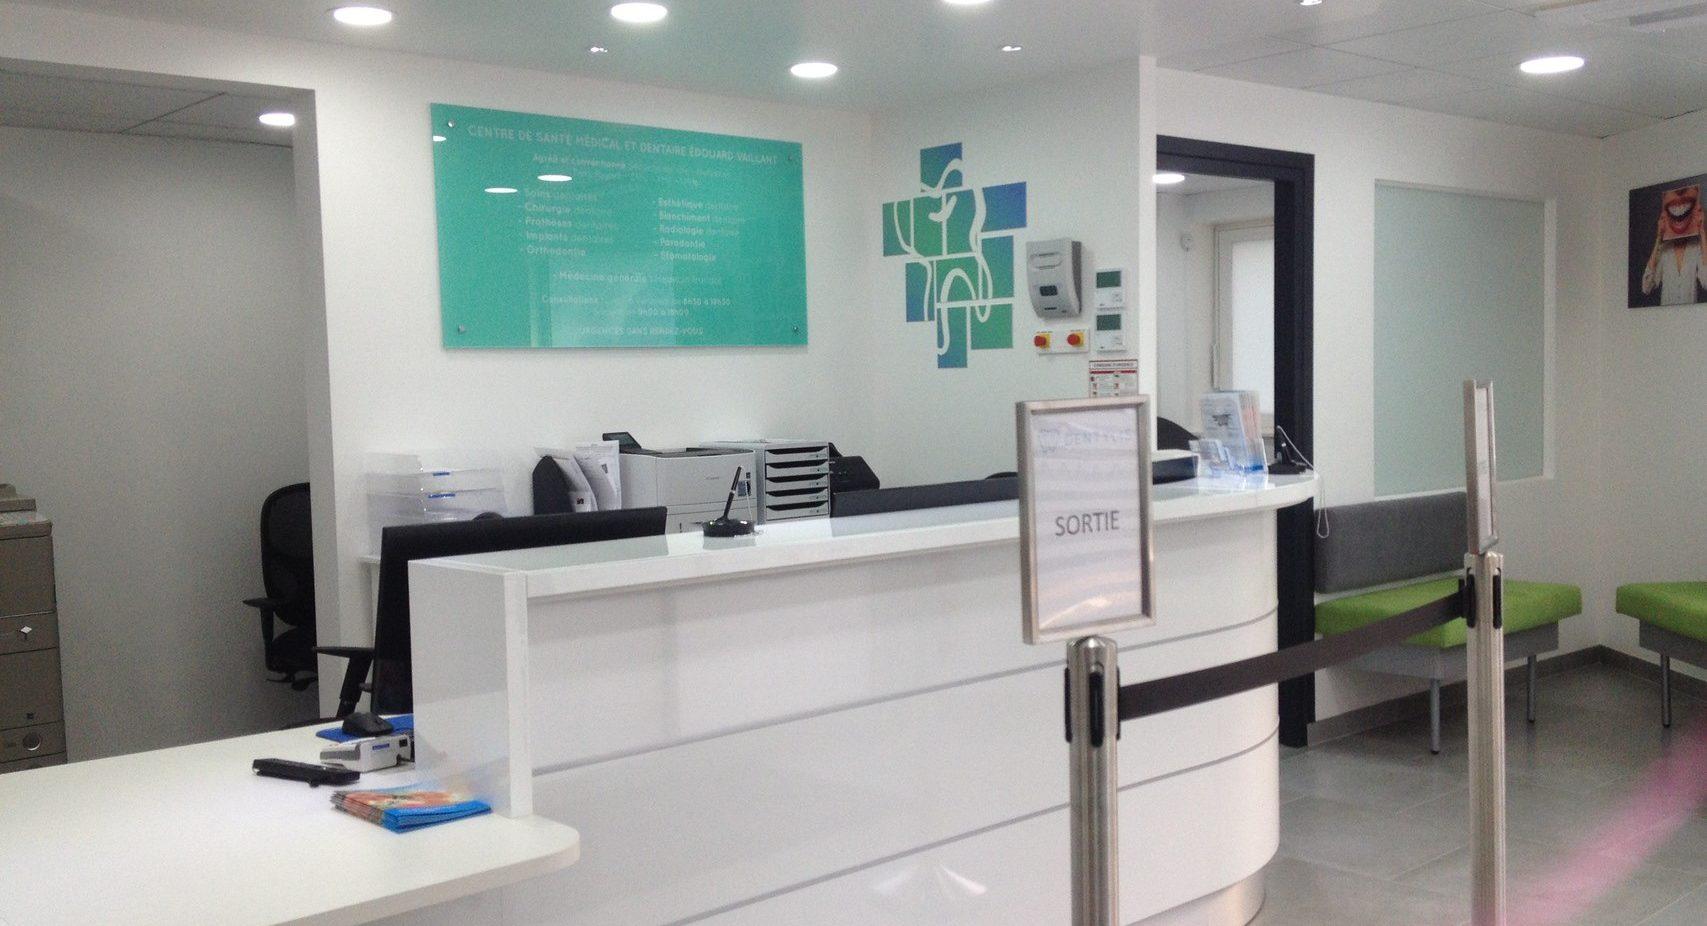 Dentistes Boulogne-Billancourt